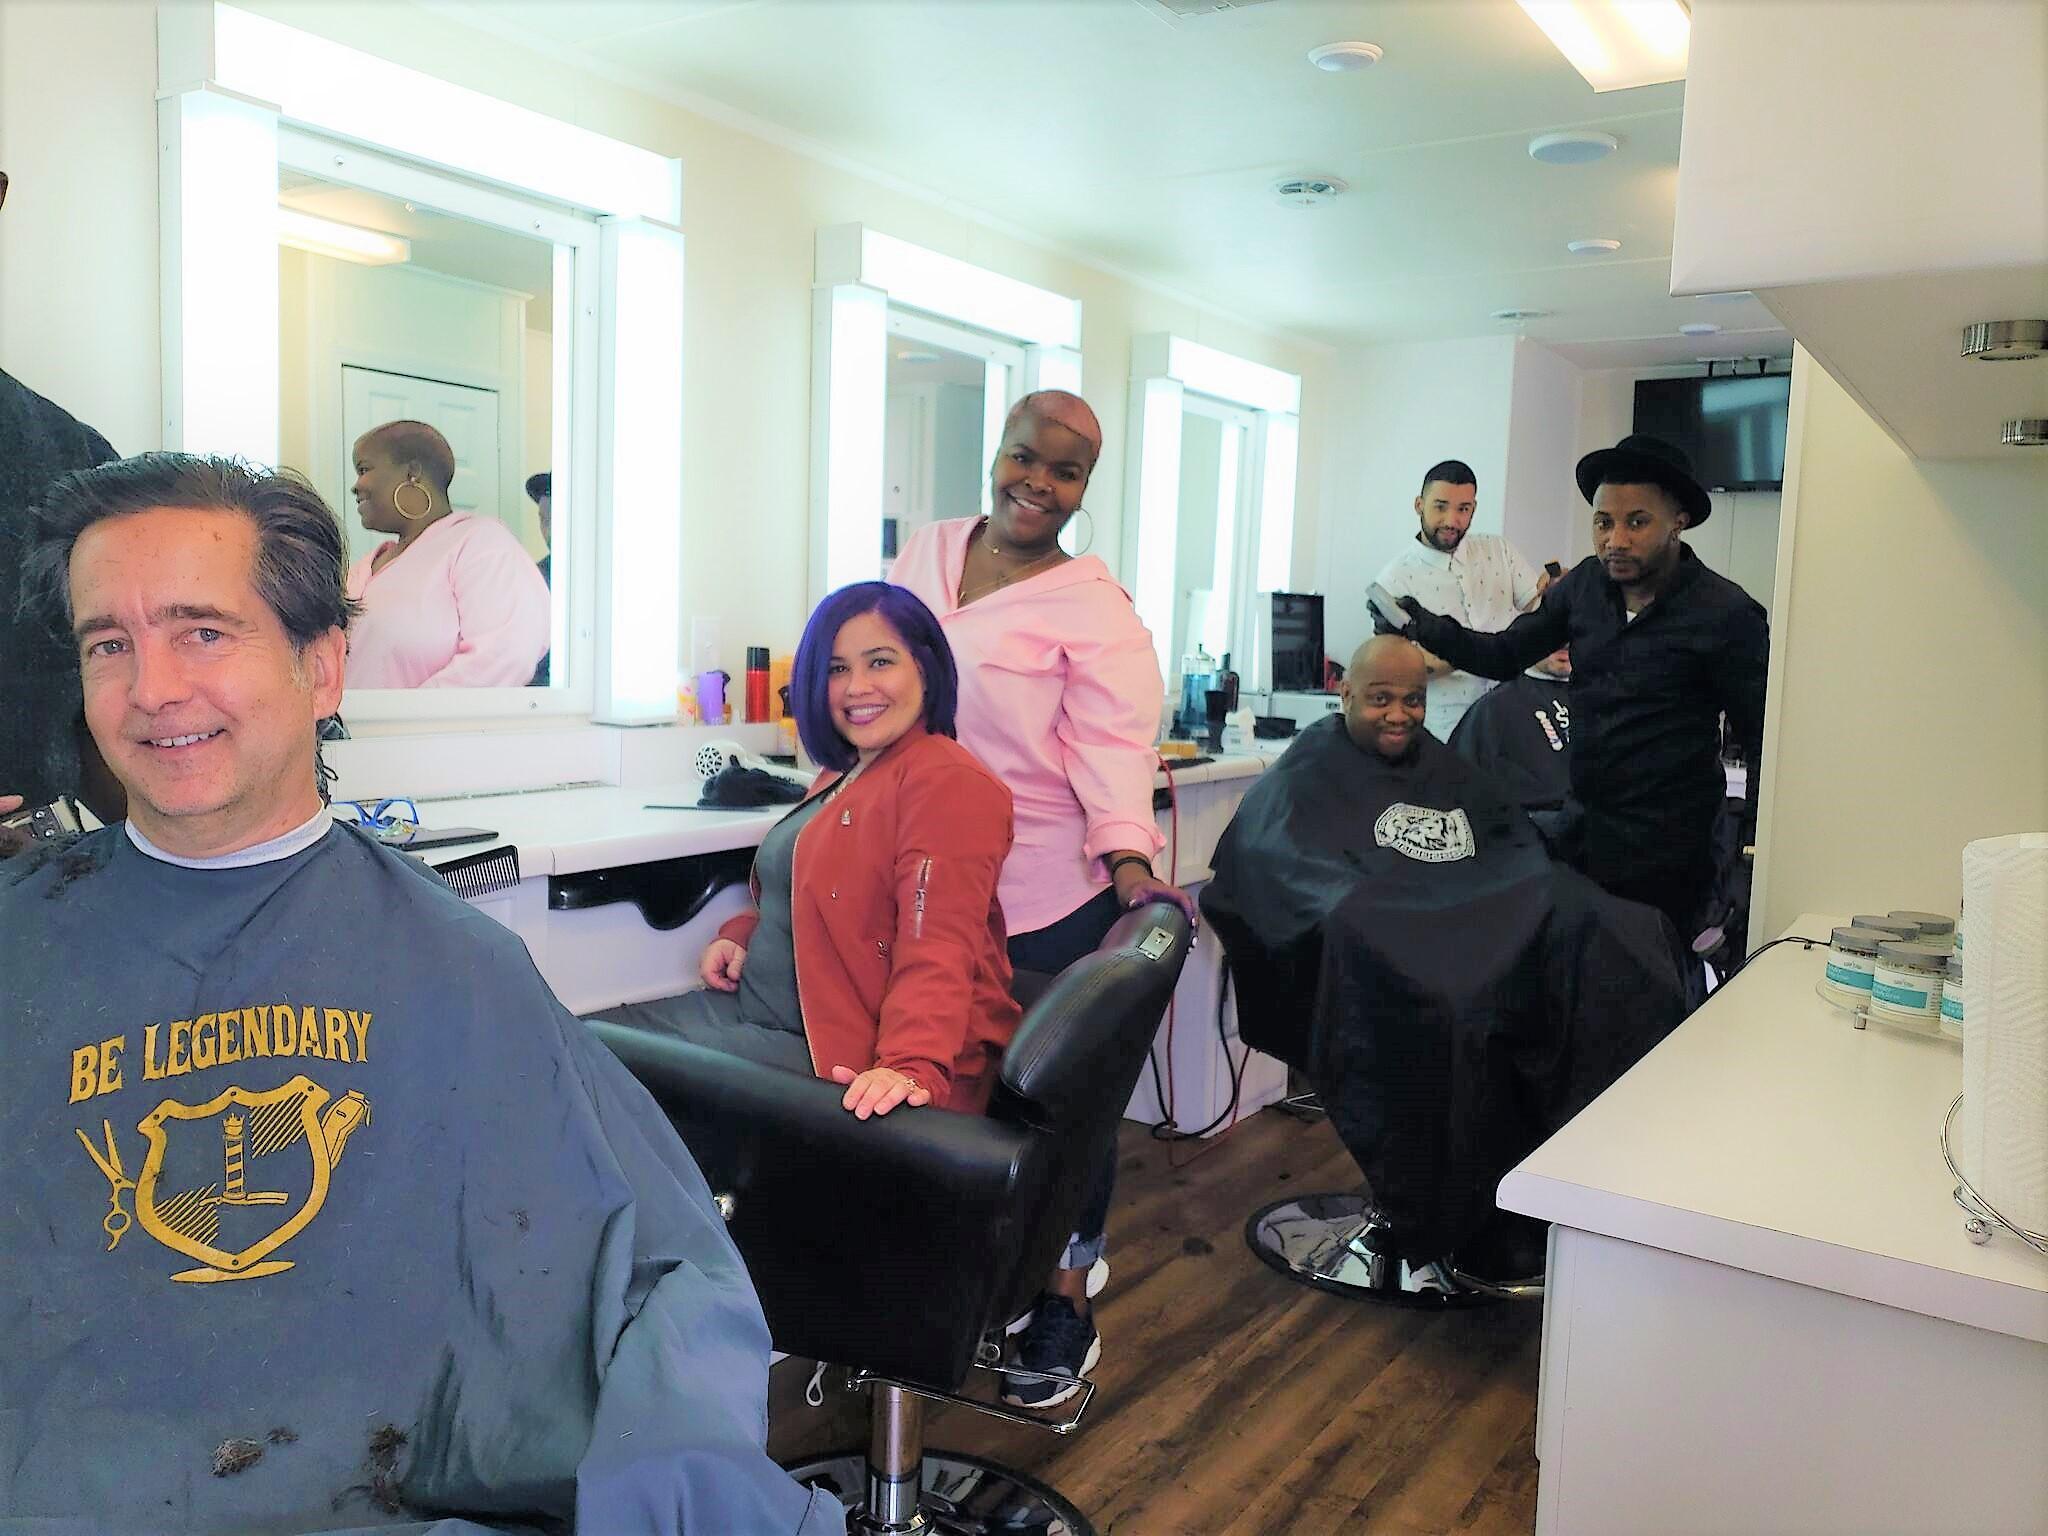 haircutting exhibition trailer